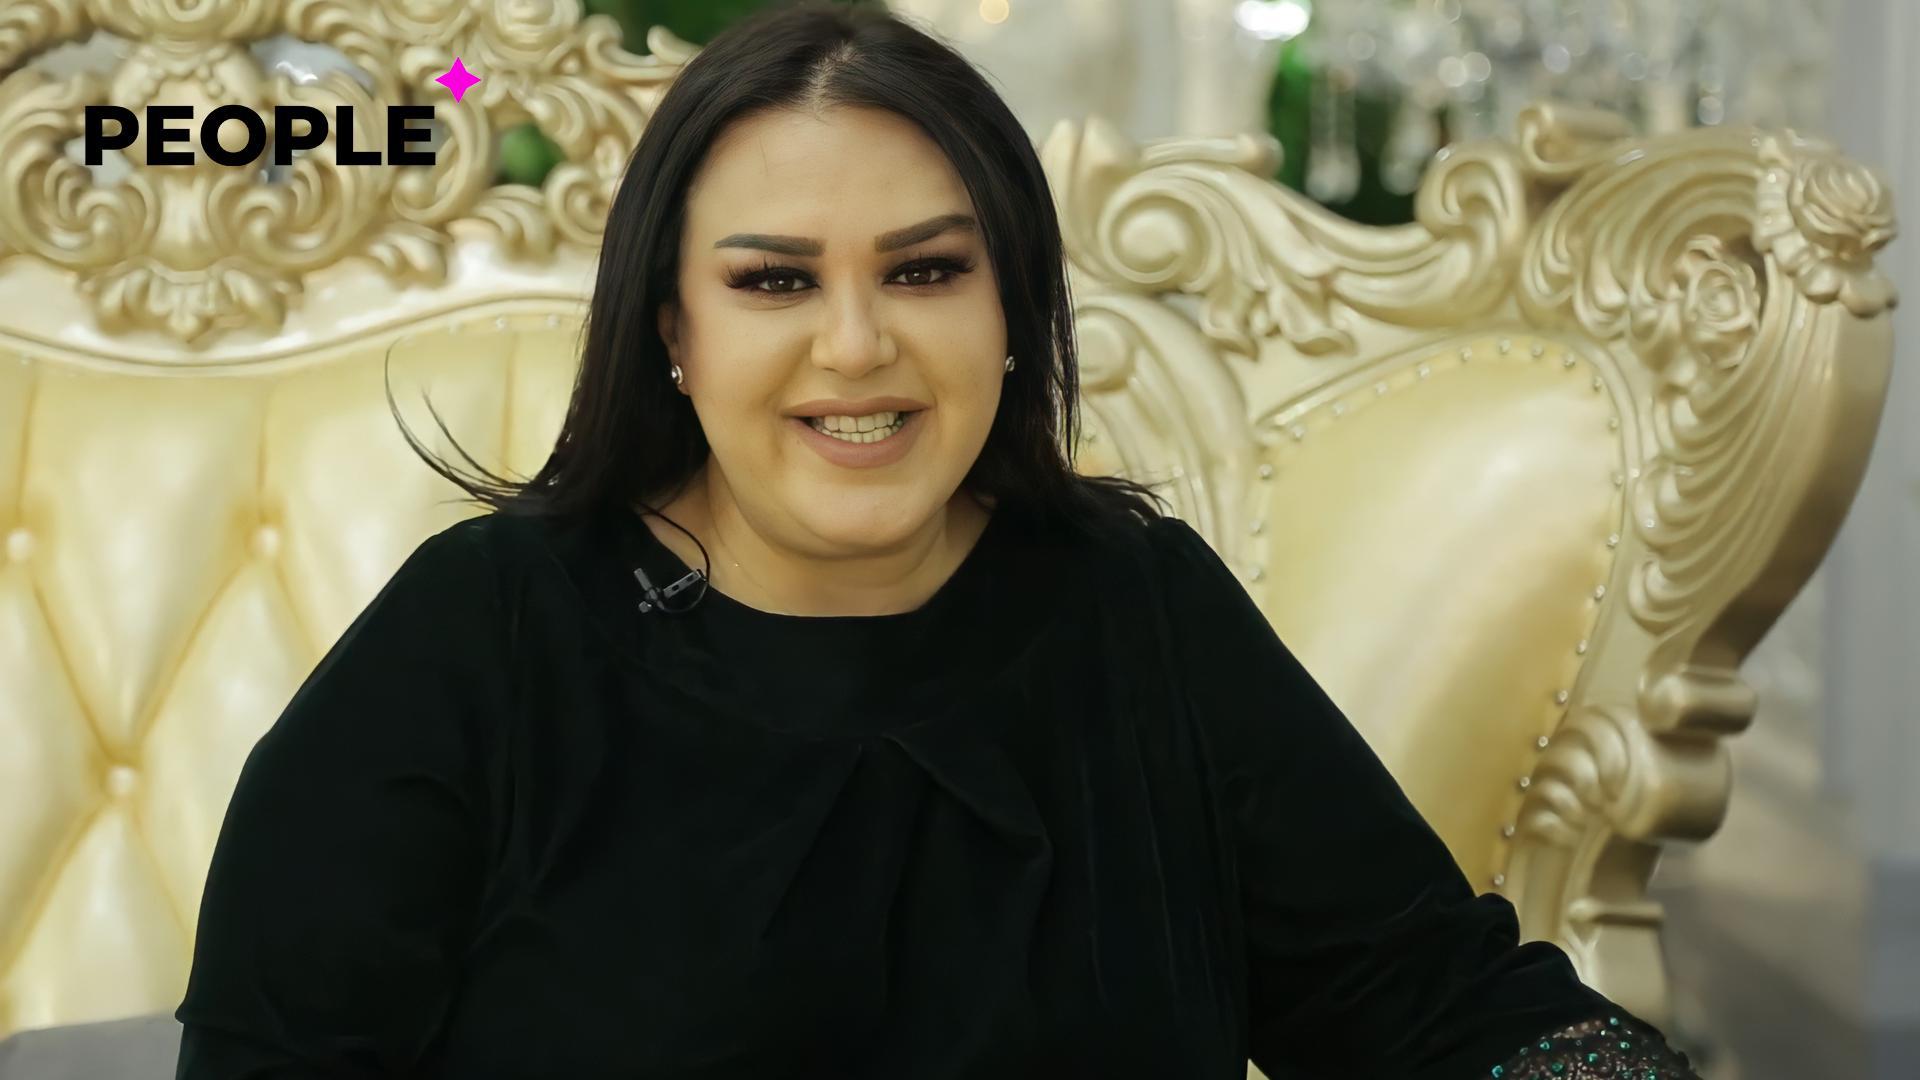 Актриса Зухра Солиева поблагодарила своего хирурга за операцию по «урезанию» желудка